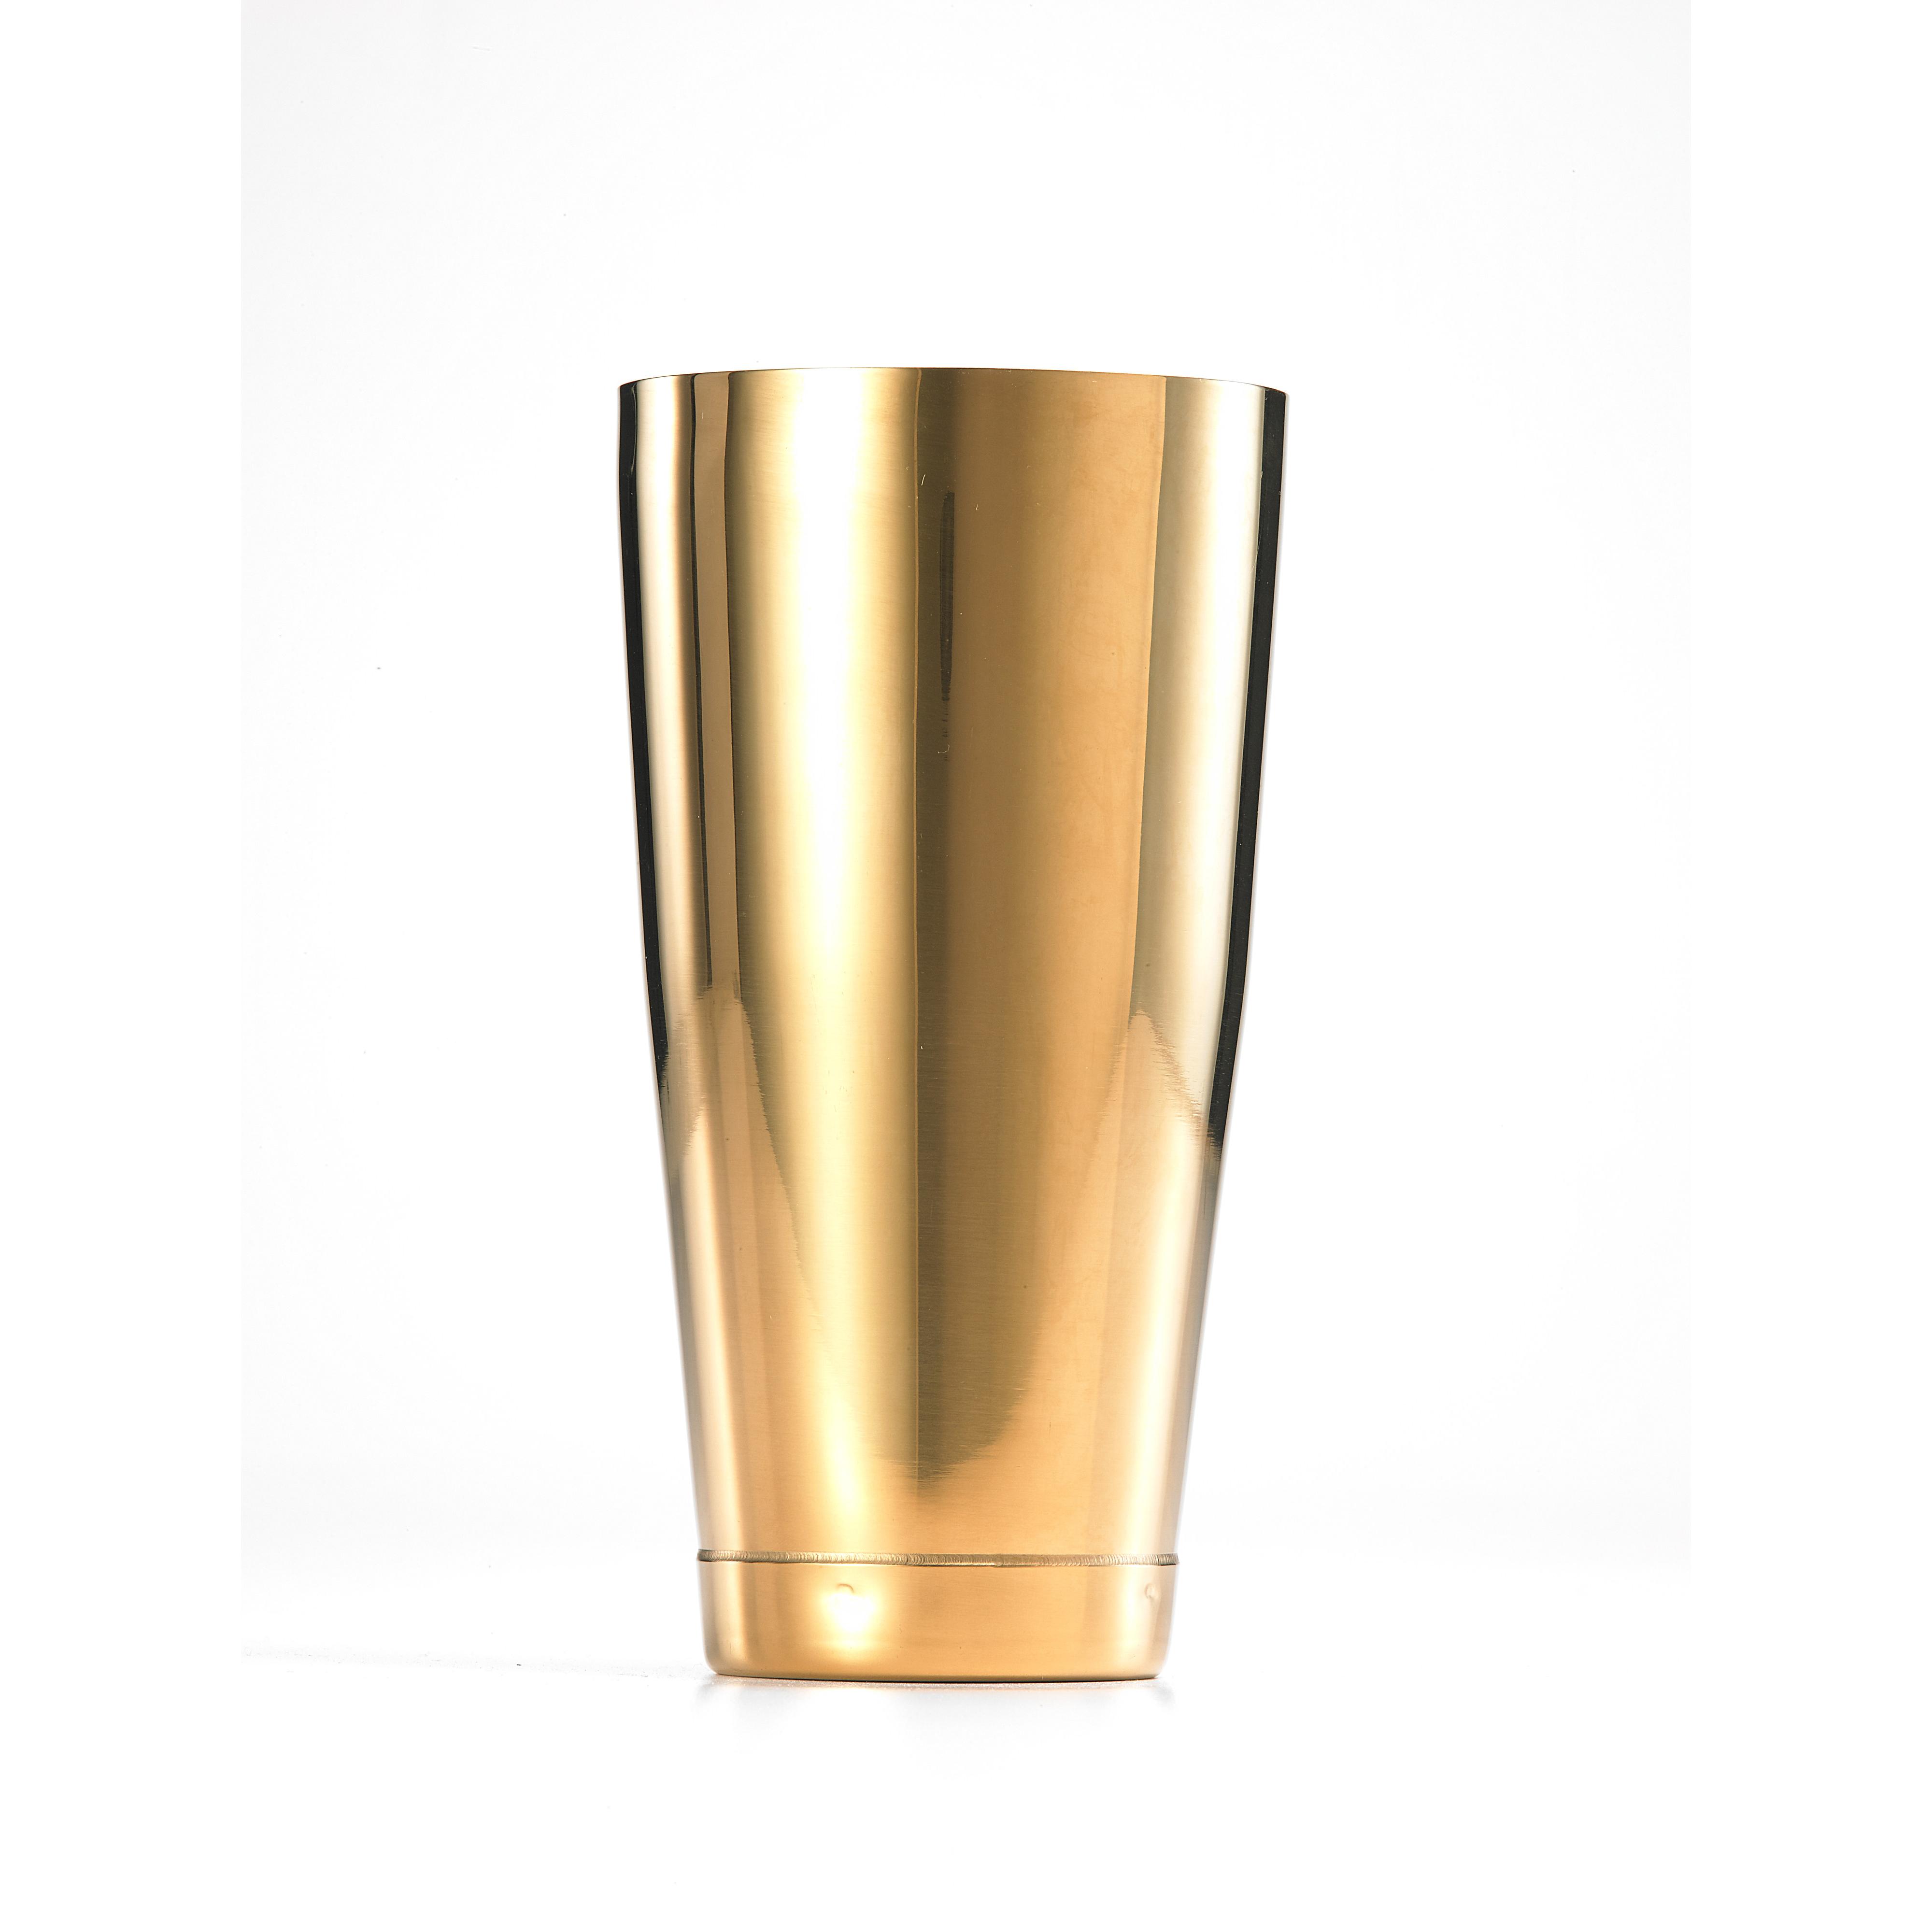 Barfly M37008GD bar cocktail shaker